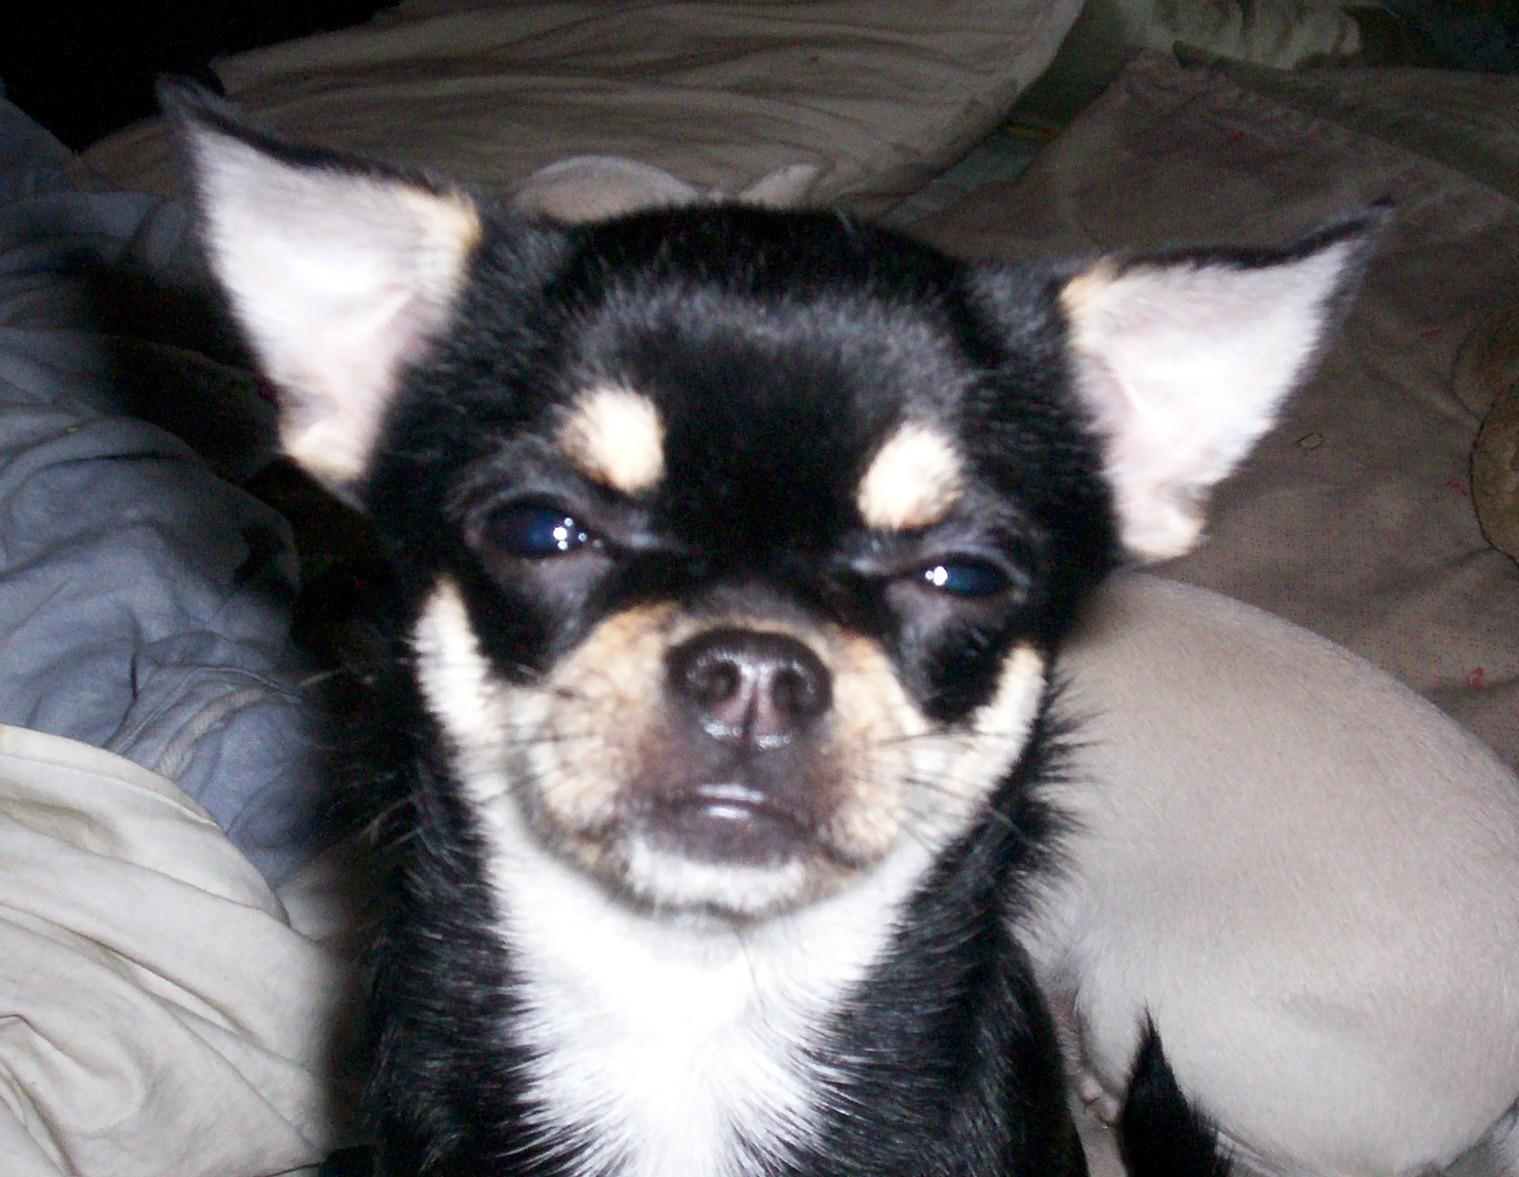 Chihuahua ♥ - Chihuahuas Photo (13609951) - Fanpop